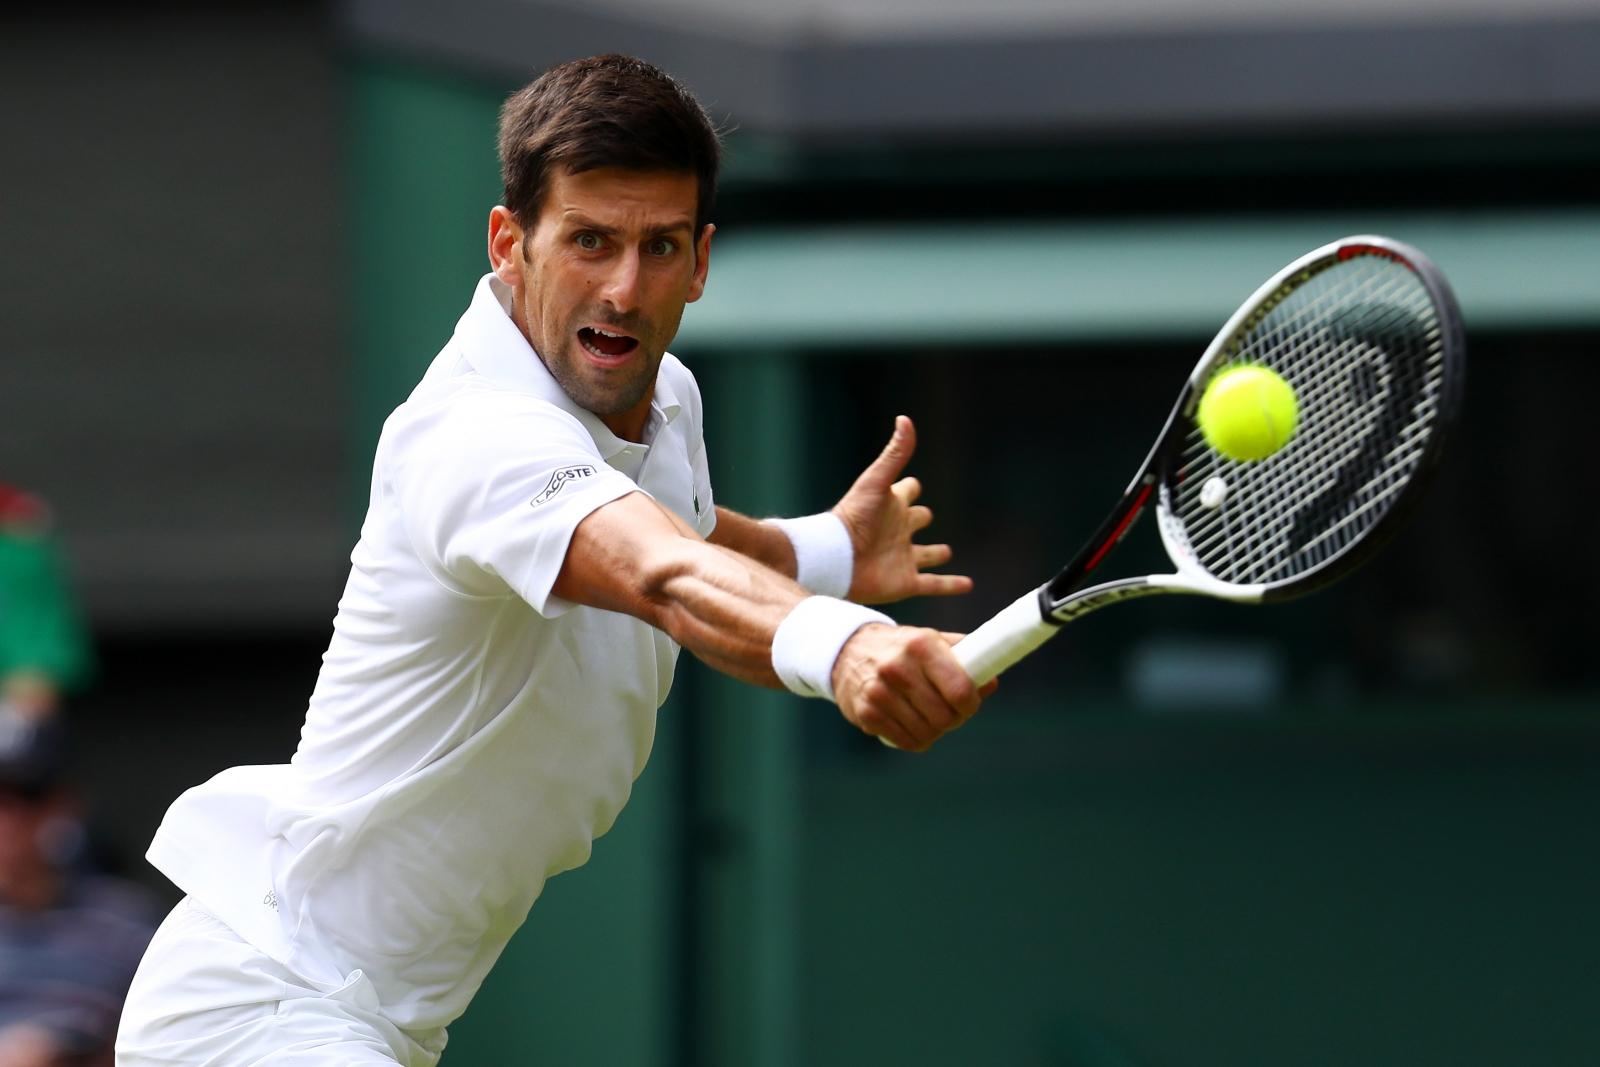 Novak Djokovic | Biography, Titles, & Facts | Britannica.com  |Djokovic